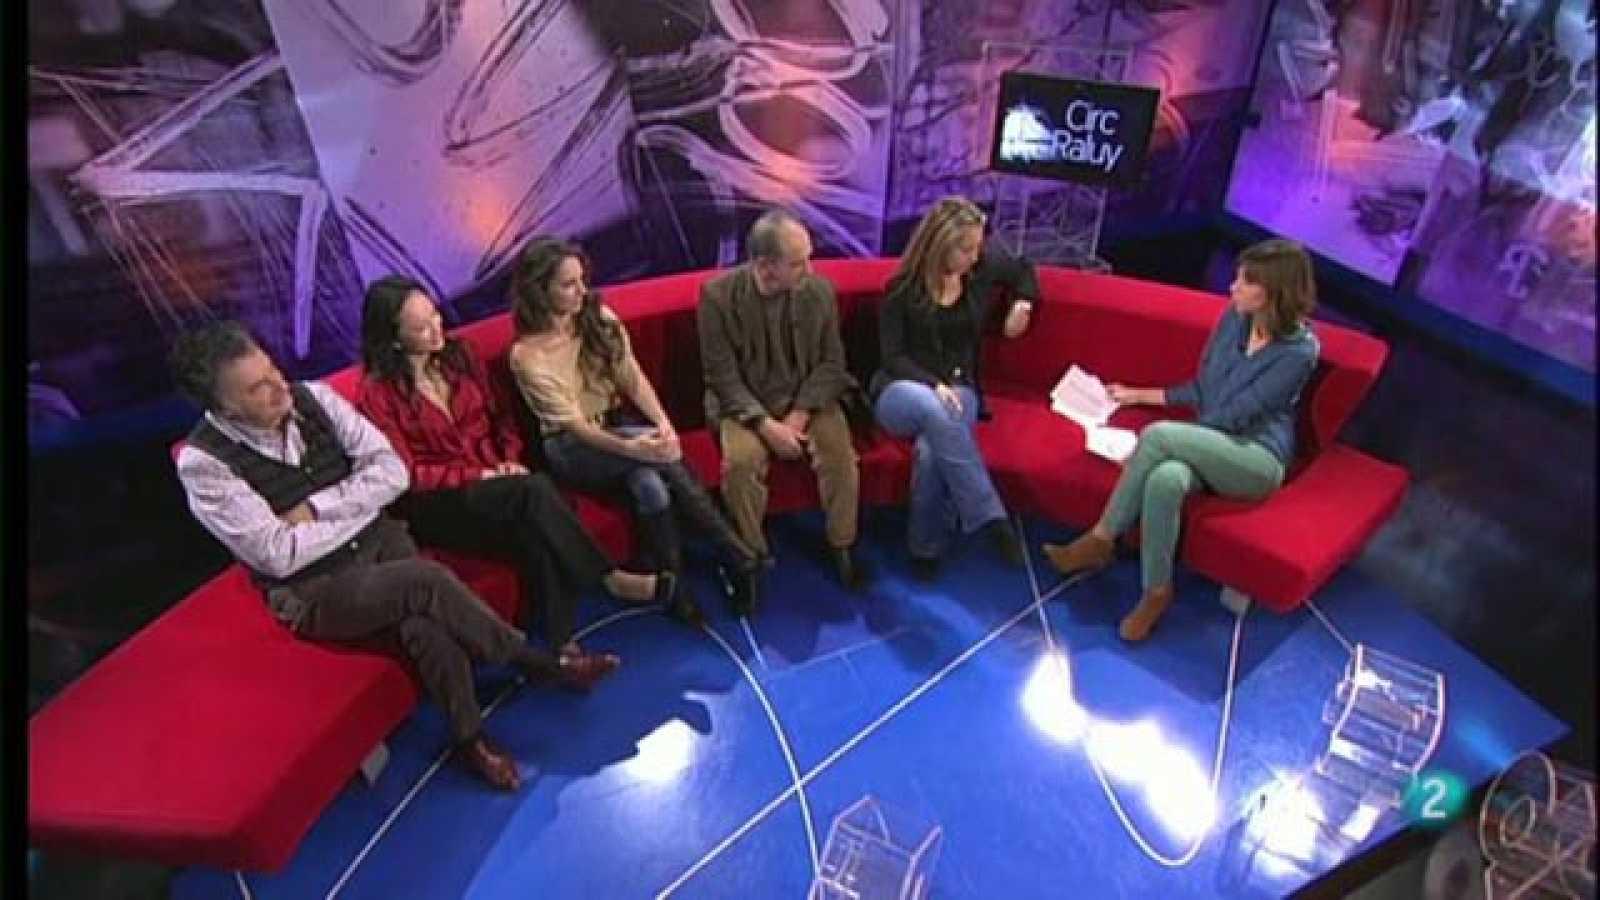 Gent de paraula - El Circ Raluy - 23/11/2012